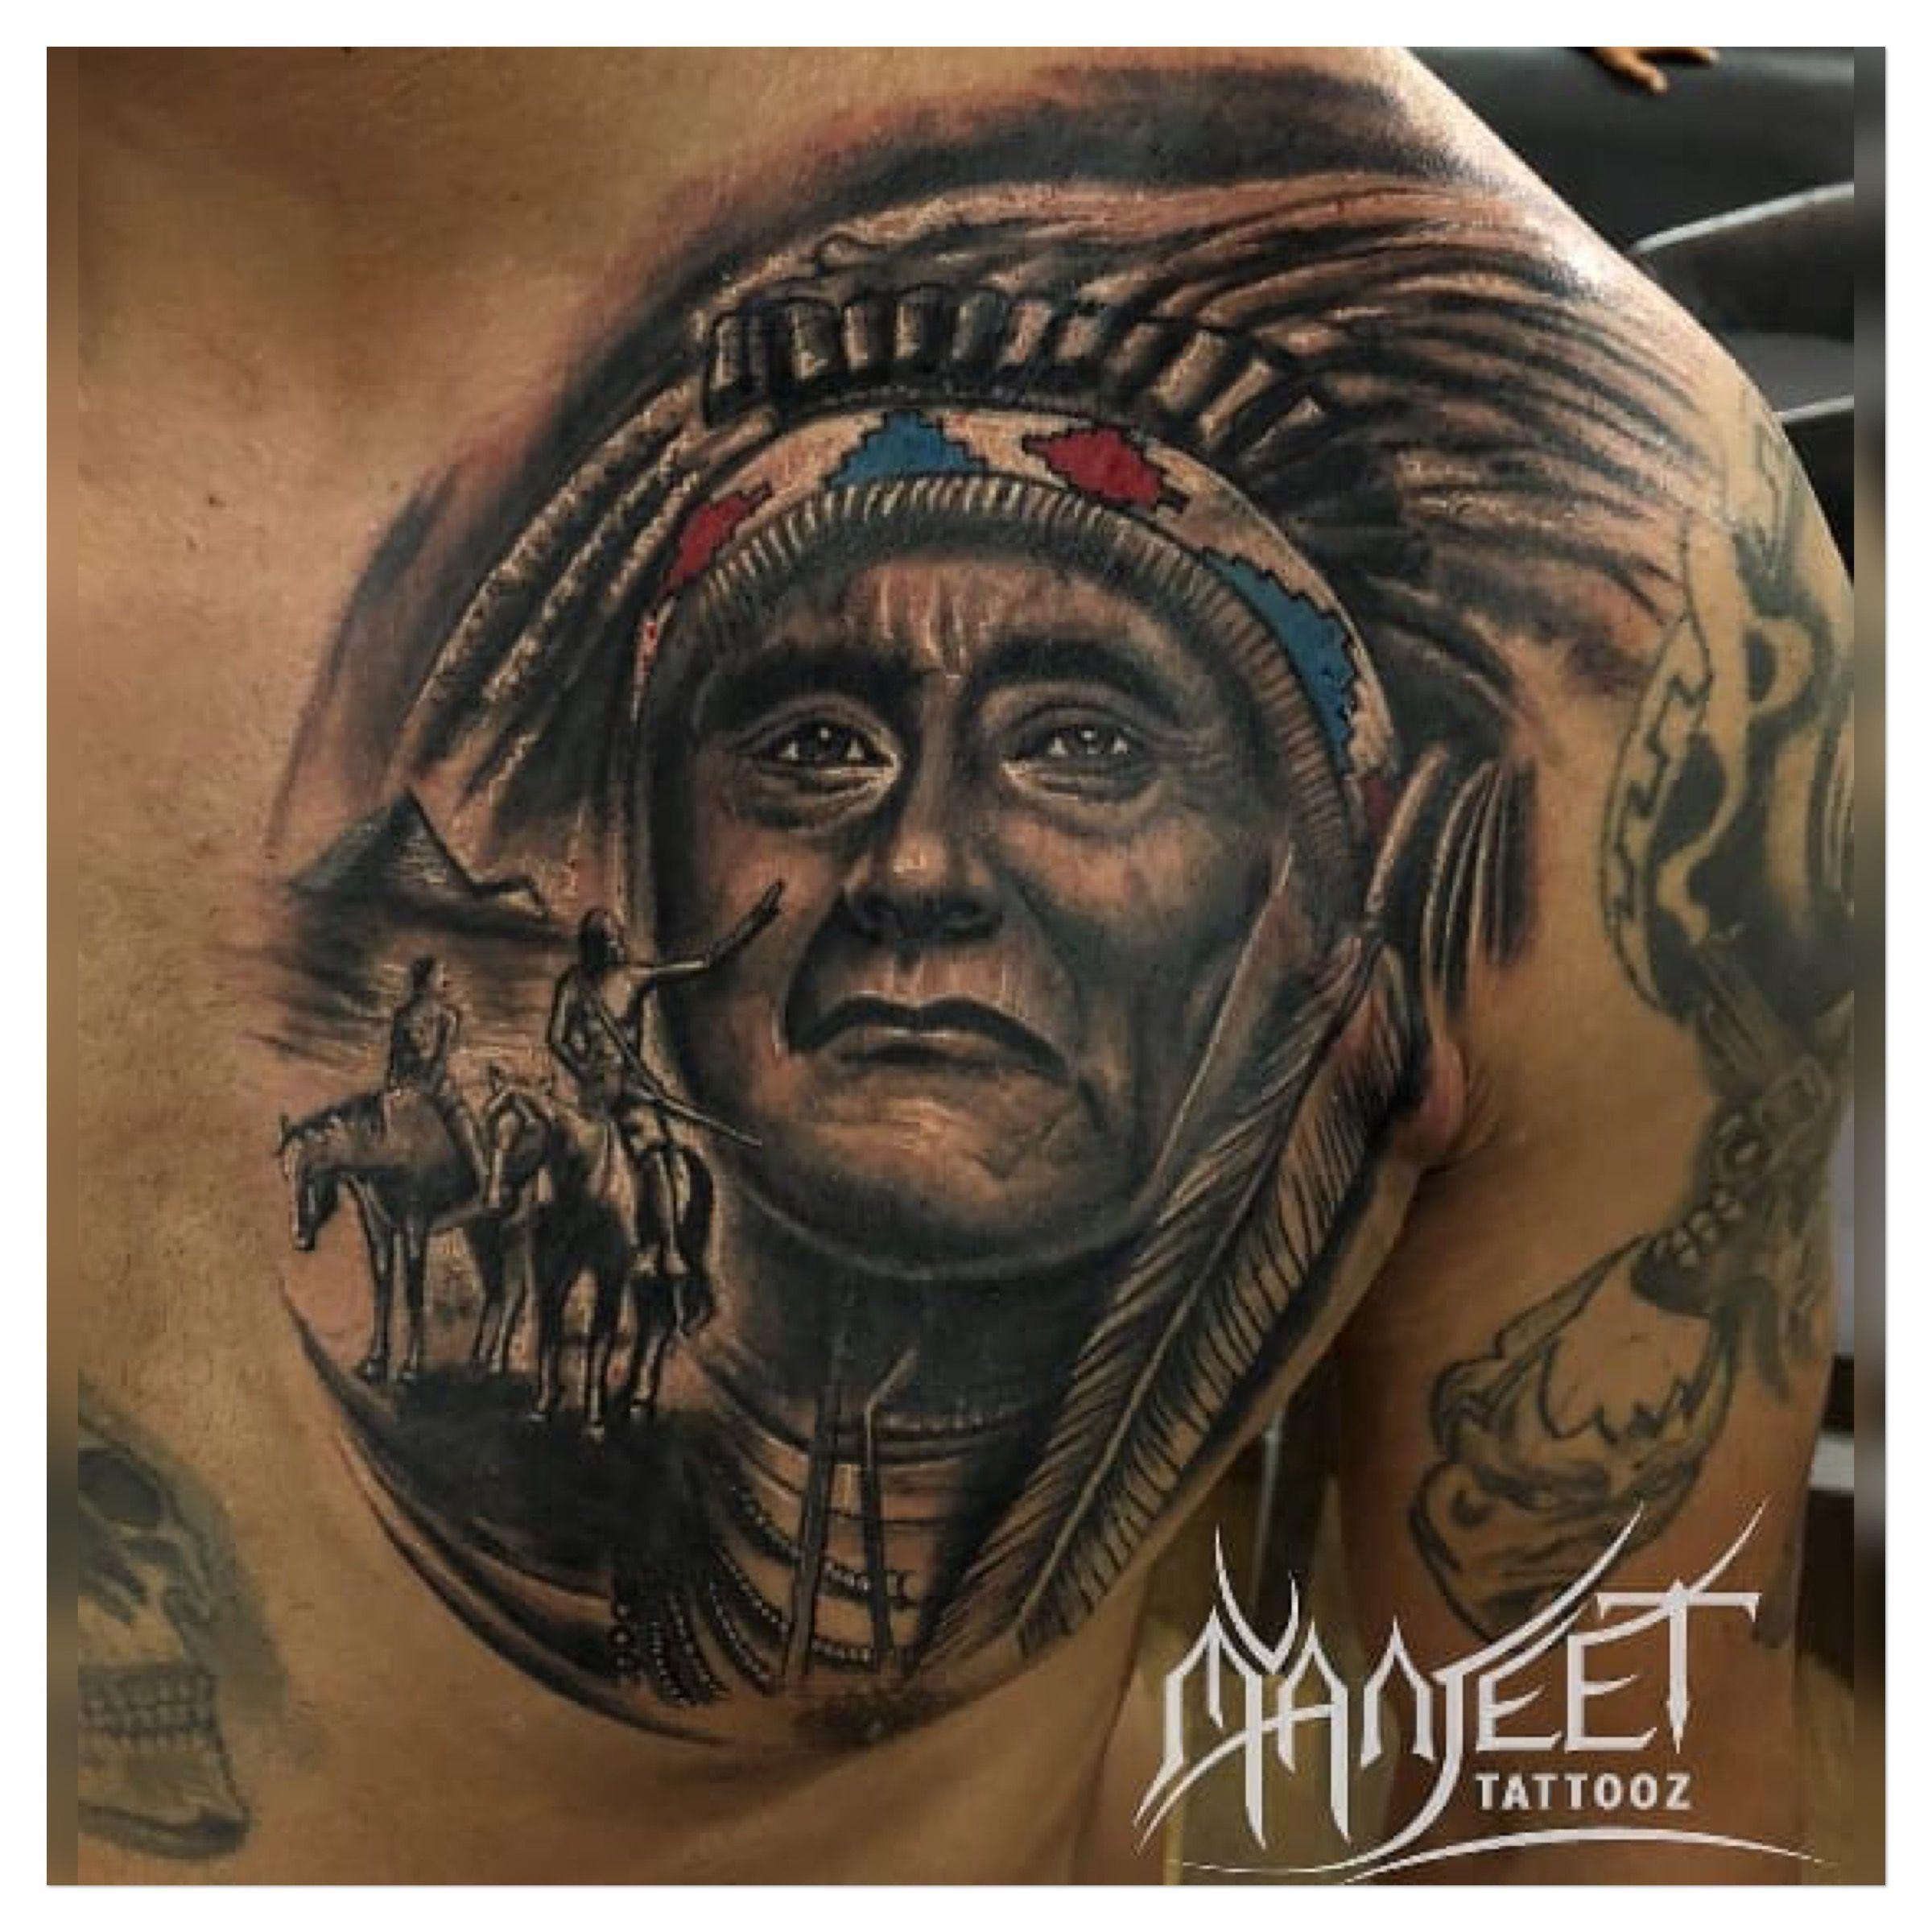 Native American Tattoo Tattoo Artists Native American Tattoo Best Portrait Tattoo Artist